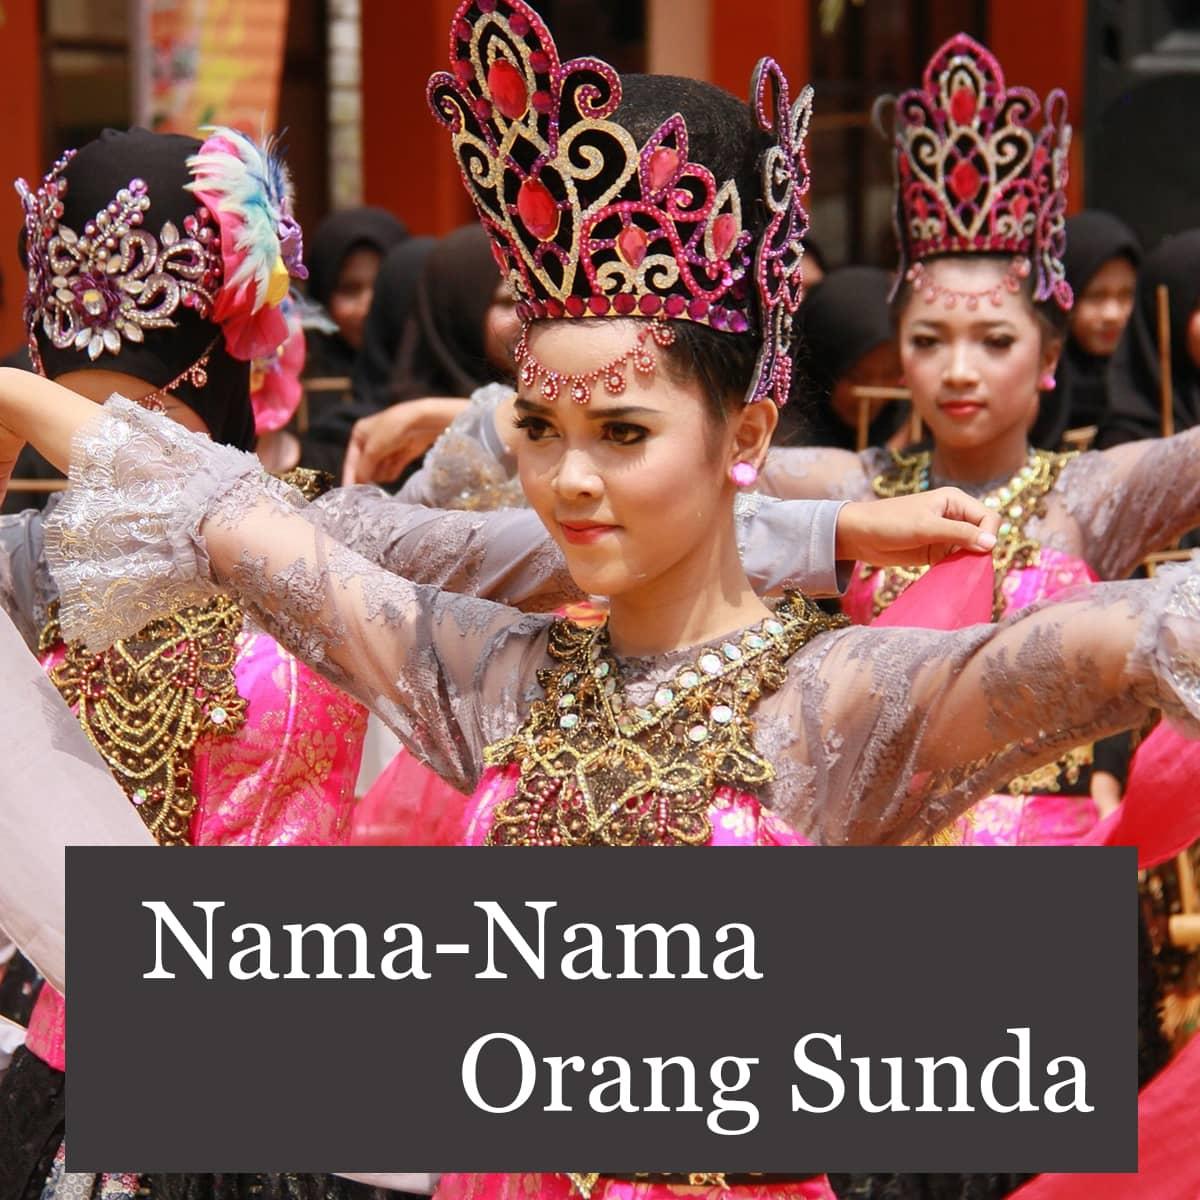 Nama-Nama Orang Sunda